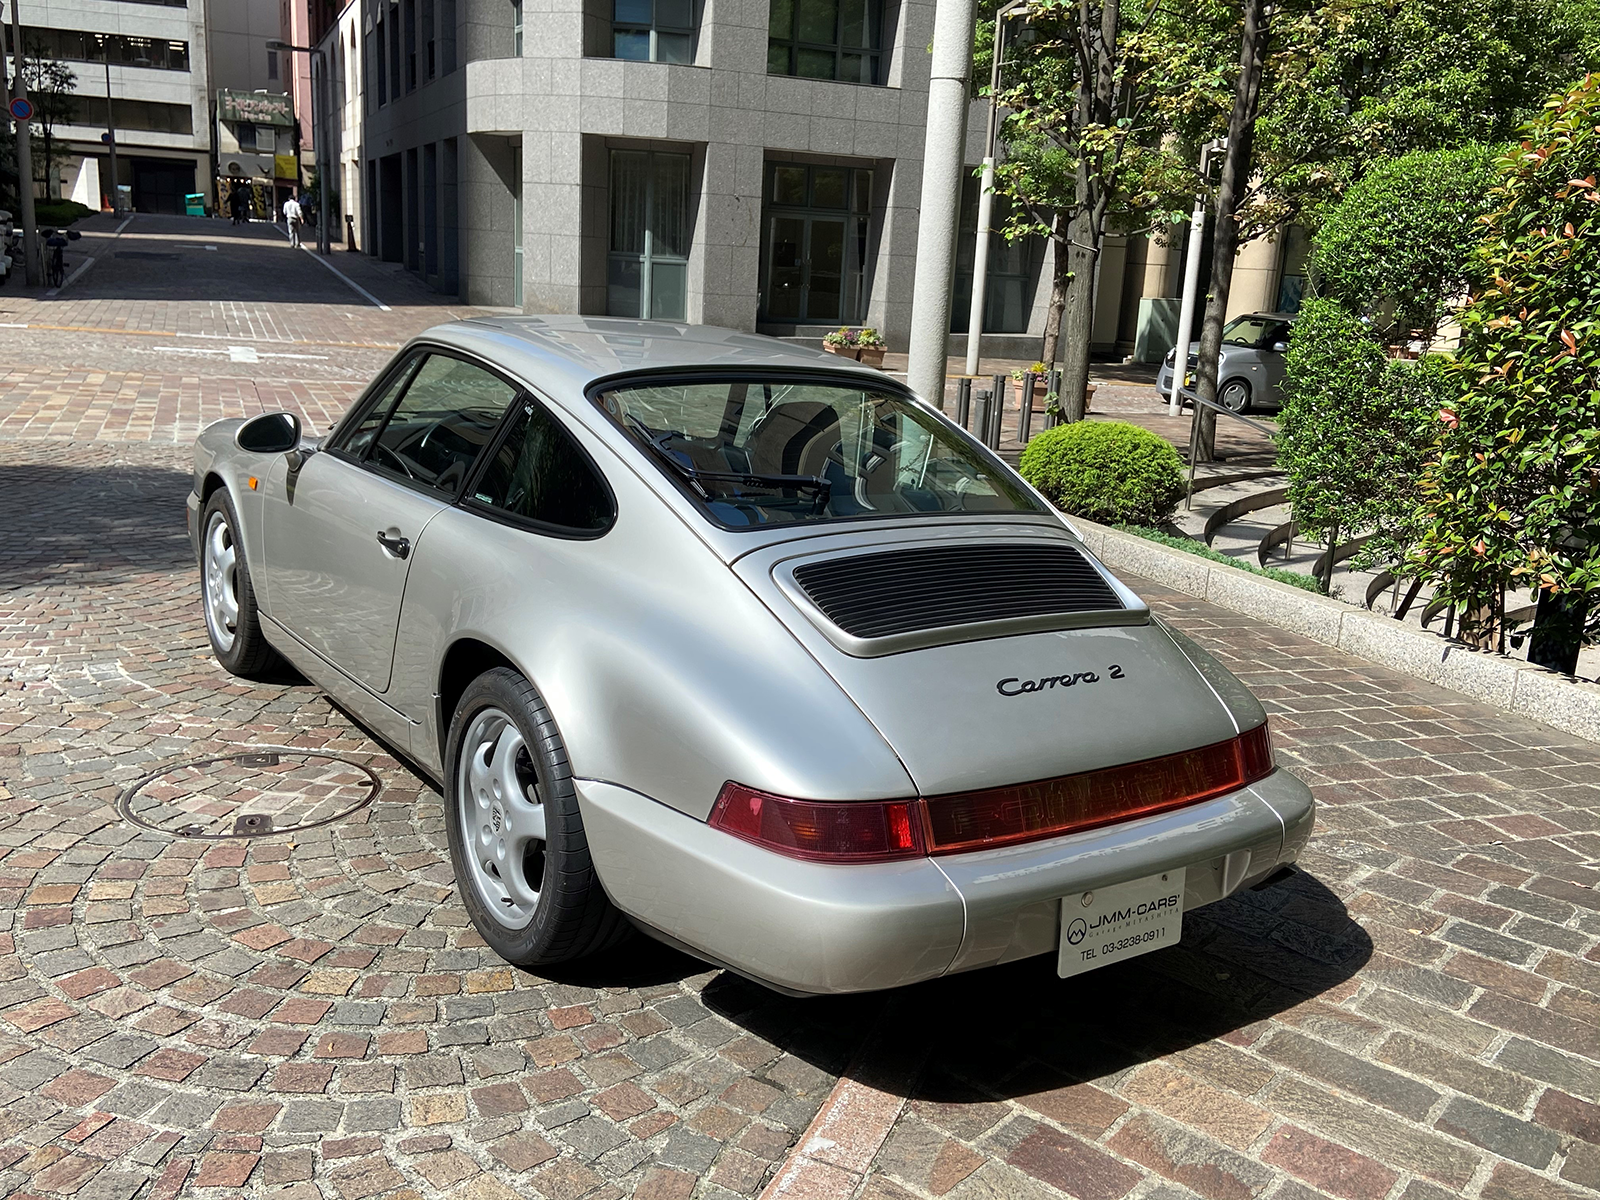 Porsche_964_TIP_Silver_199x_20200930_3_2